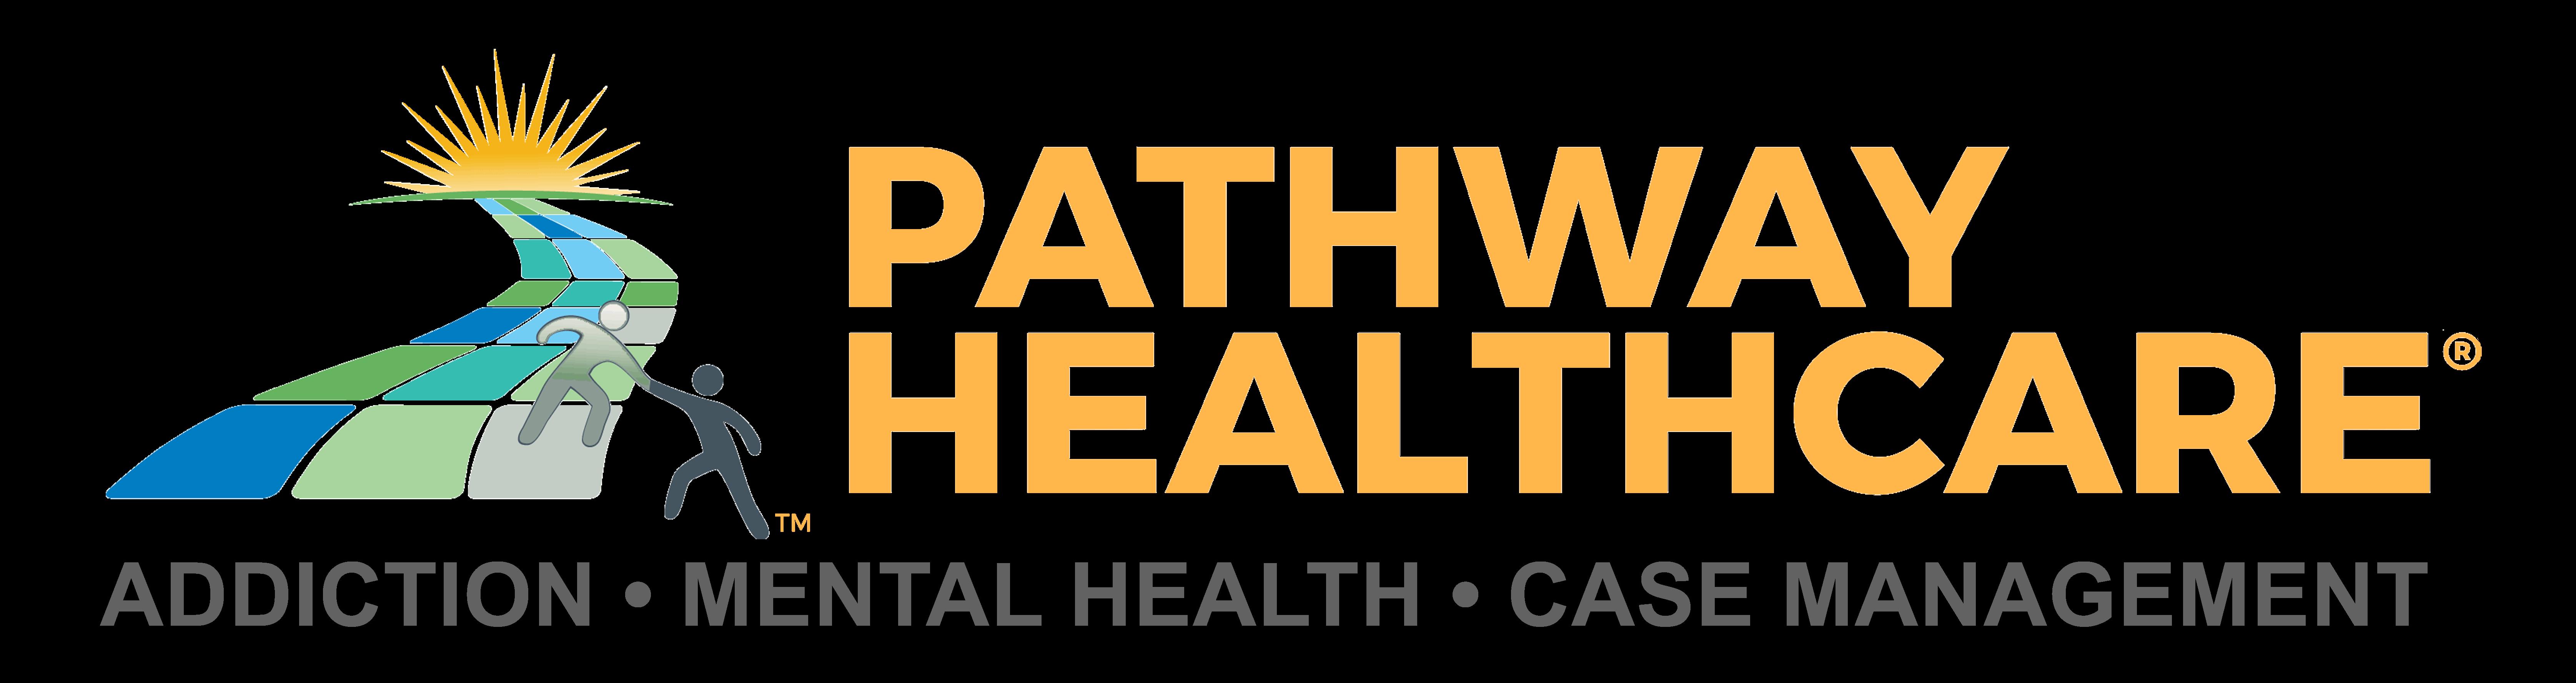 Pathway Healthcare